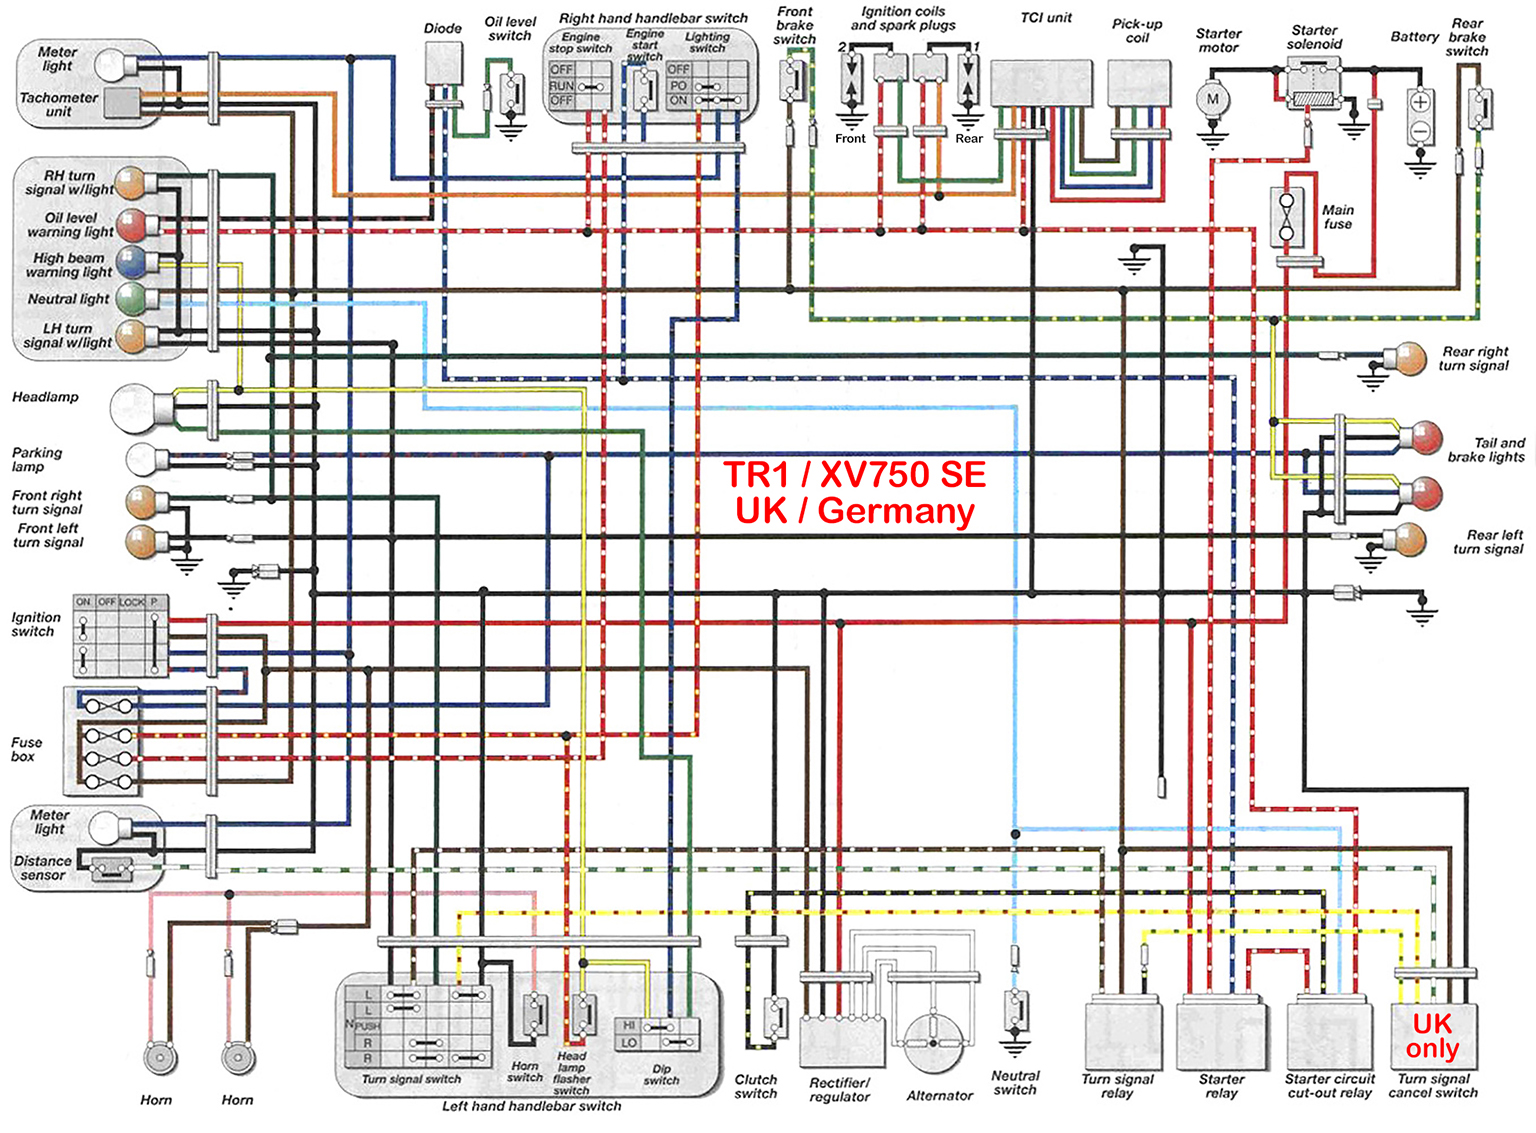 DIAGRAM] Yamaha Virago 750 Wiring Diagram FULL Version HD Quality Wiring  Diagram - CLASSDIAGRAM.ADORATRICIPERPETUEVIGEVANO.ITclassdiagram.adoratriciperpetuevigevano.it